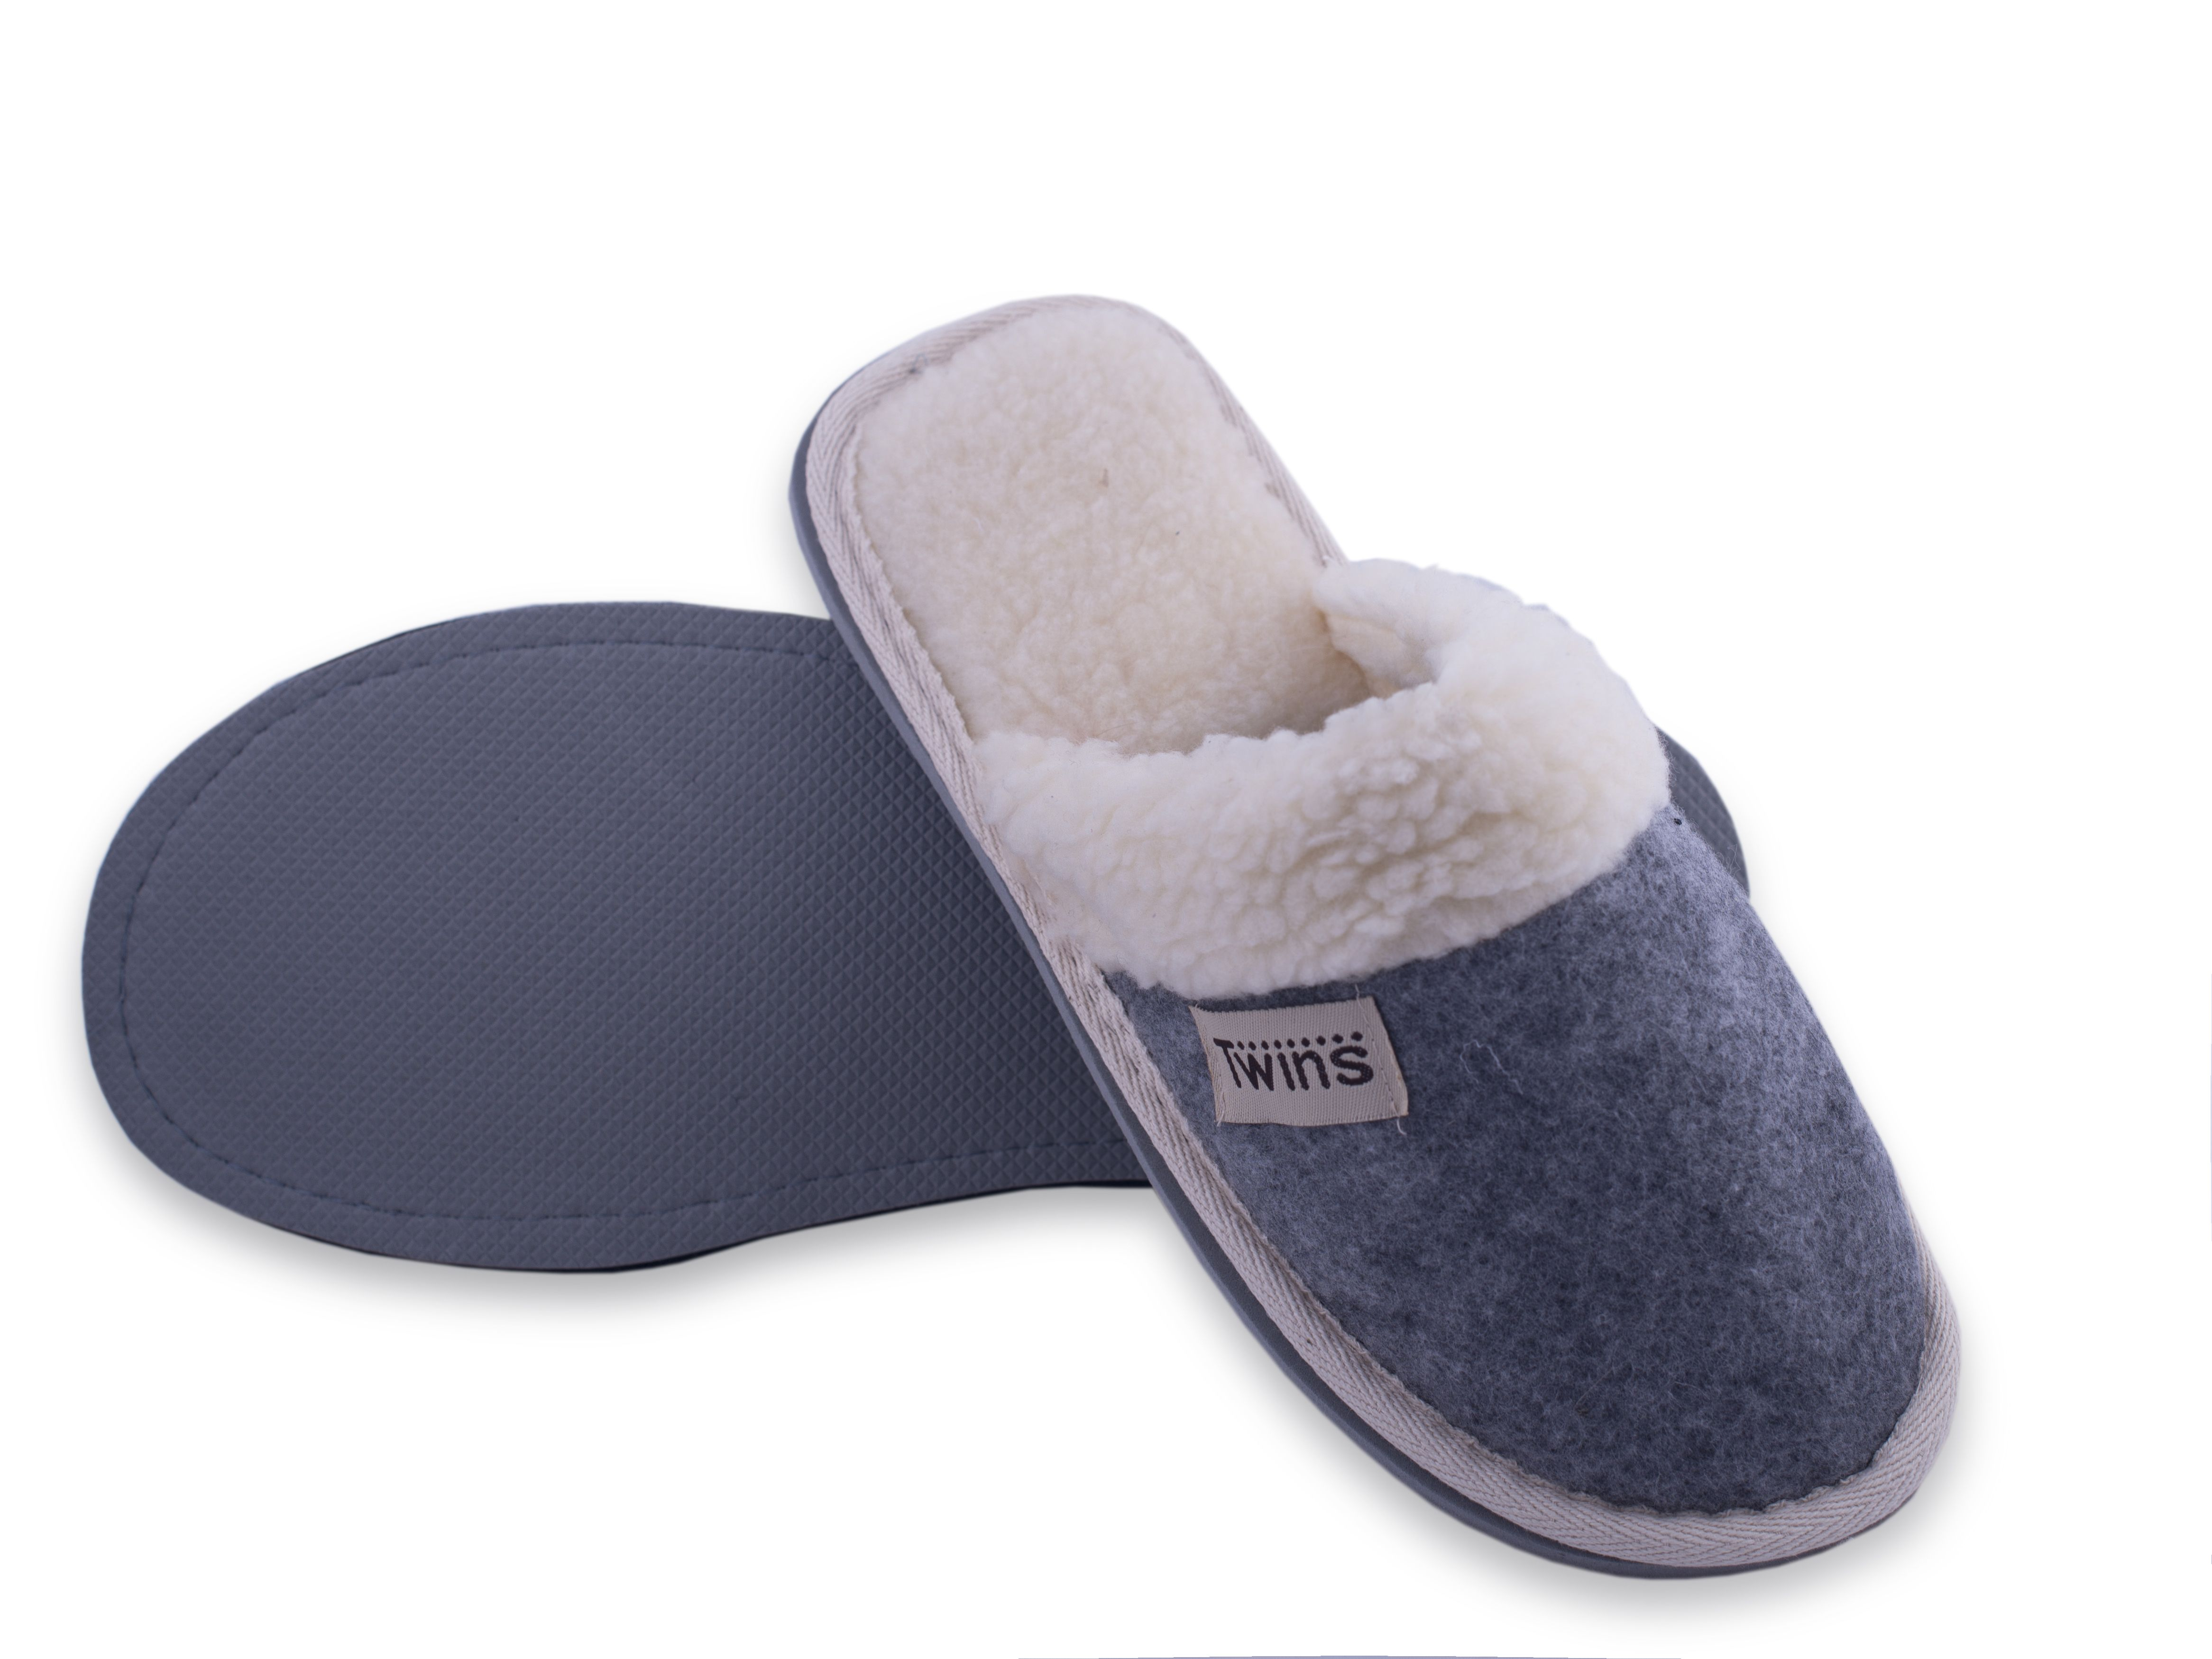 Herren Winter Schlappen Warme Hausschuhe Unisex Home Slipper Schuhe Pantoffel